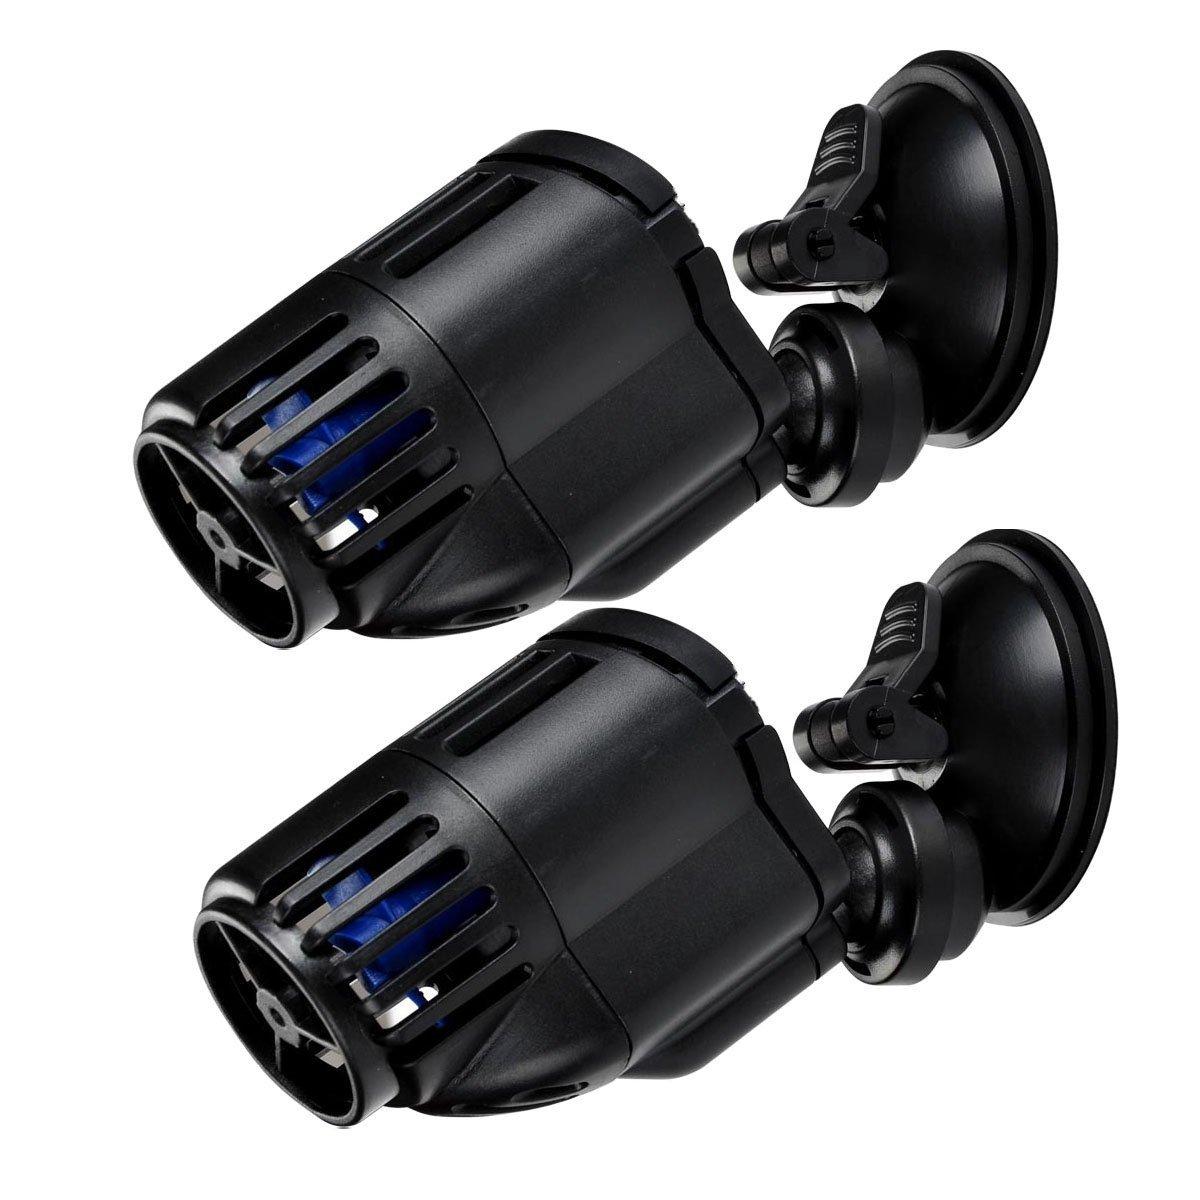 SUN 2 Piece JVP Series Submersible Circulation Power Head Pump, 530 GPH